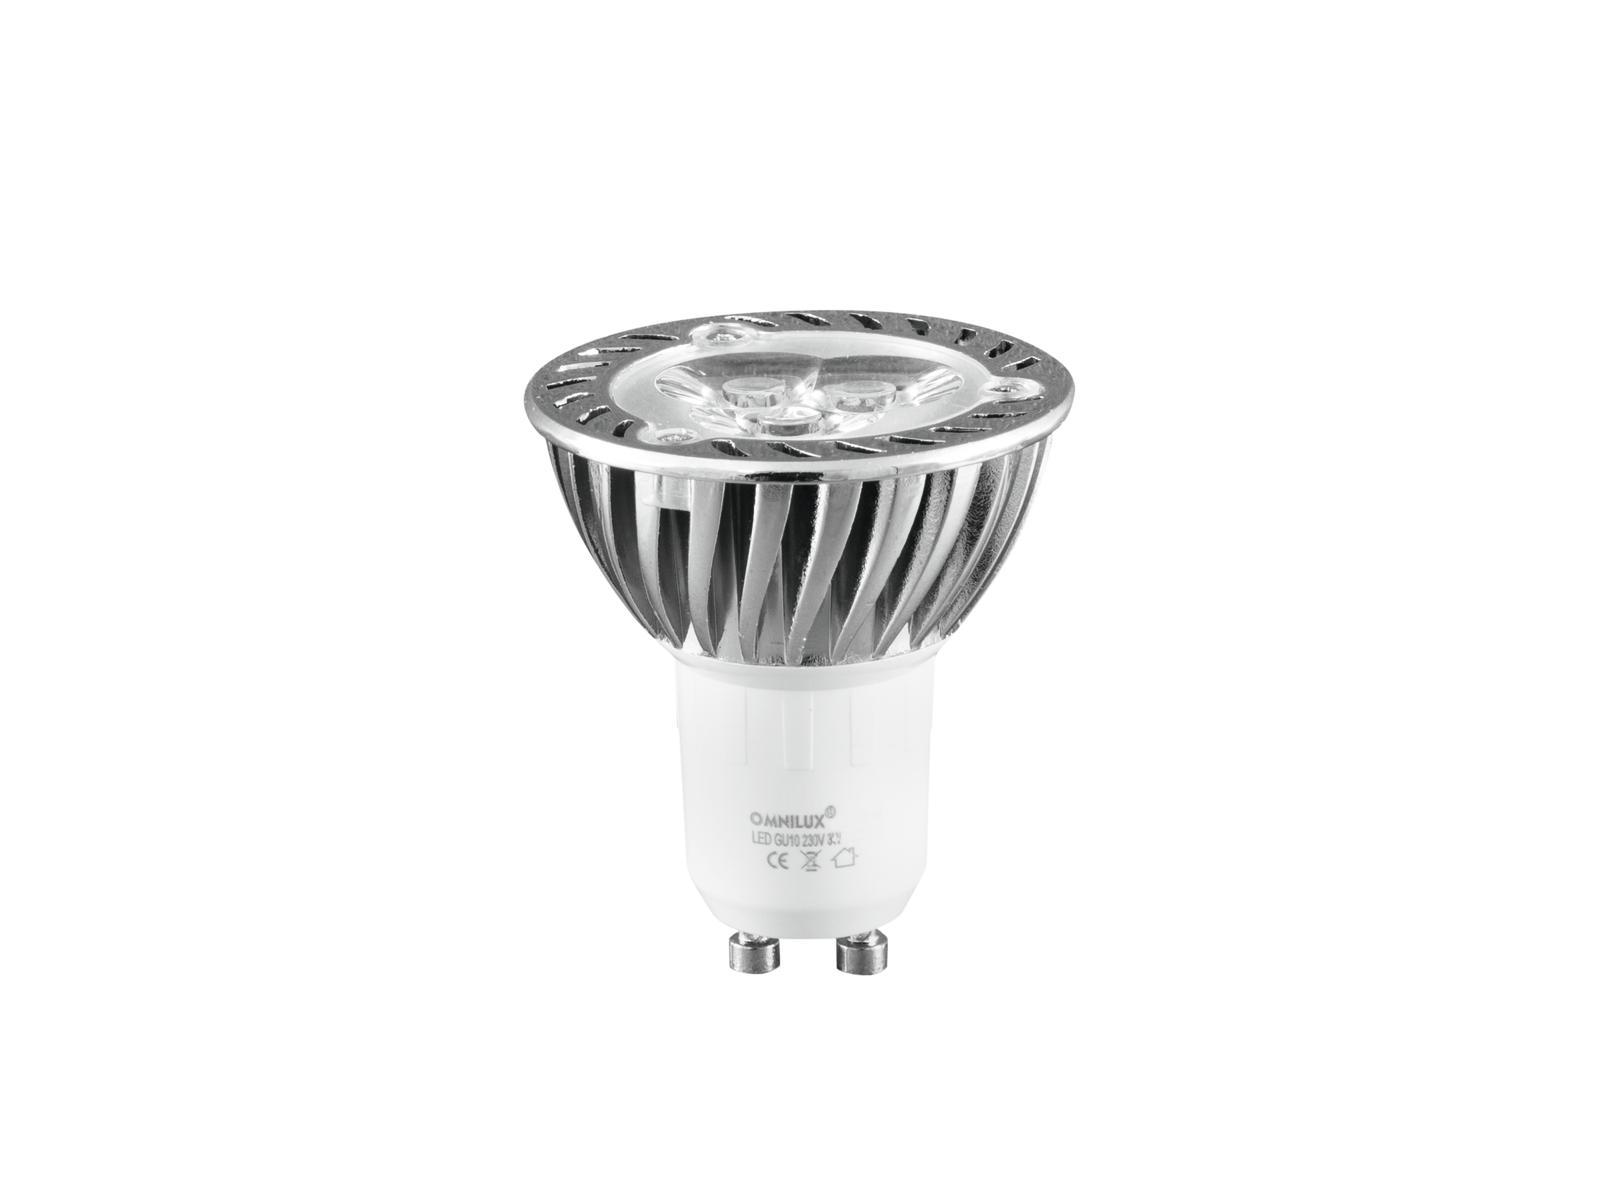 230V GU-10 3x1W LED Omnilux, zelená, chladič